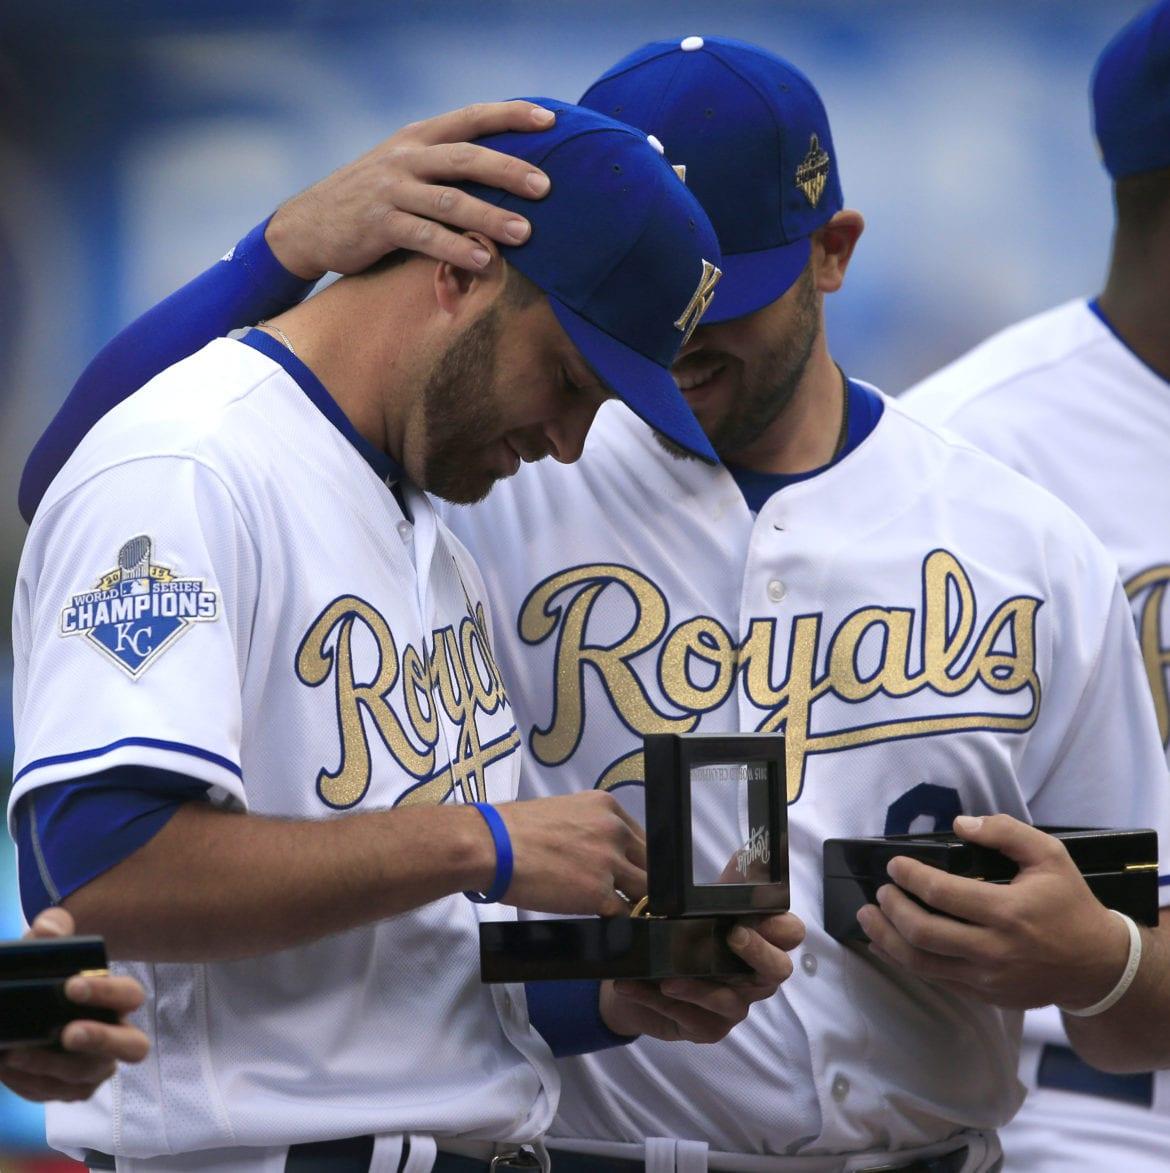 Baseball players looking at their world series rings